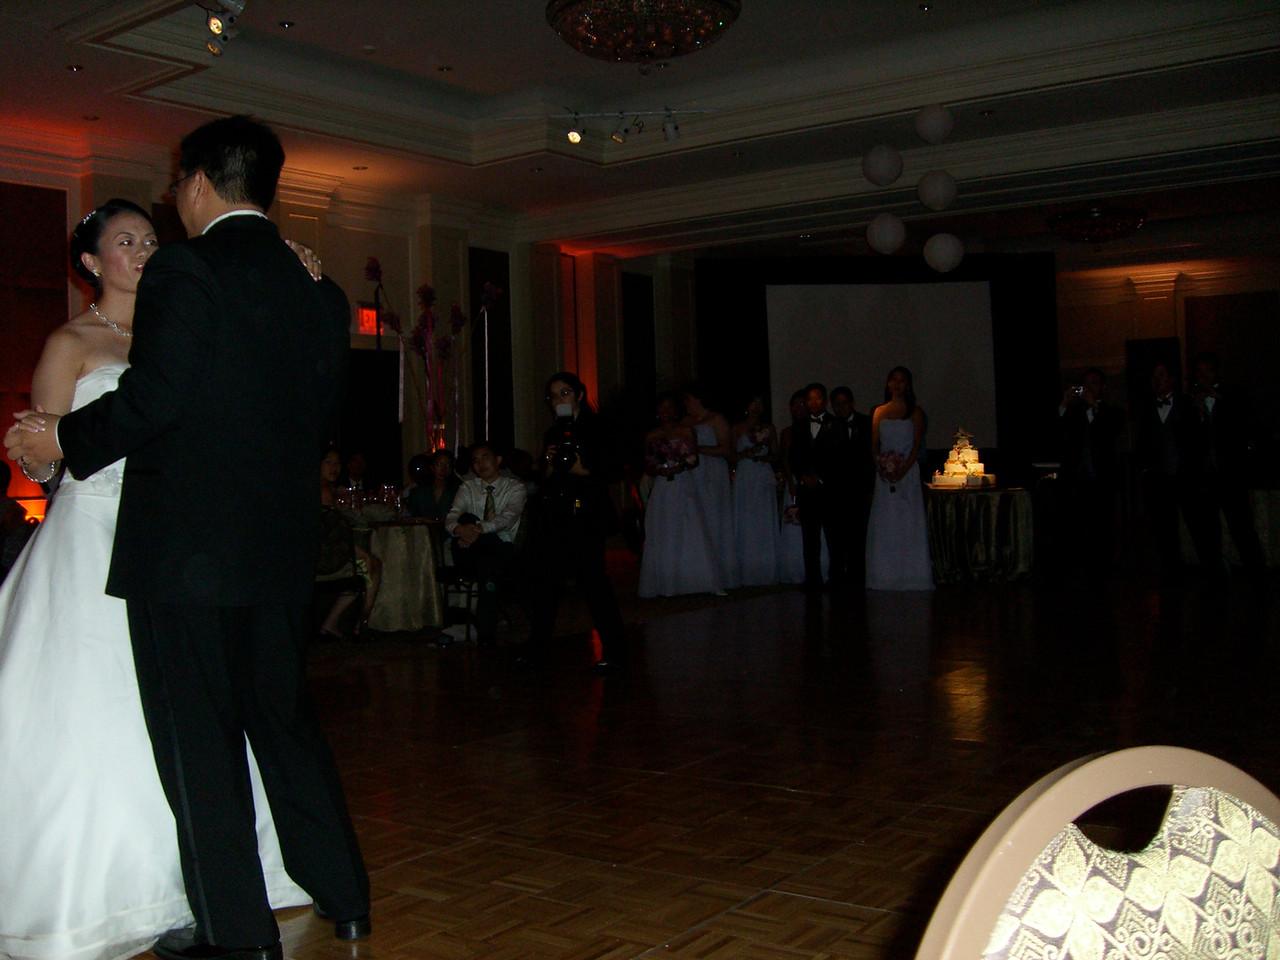 Reception - First dance 4